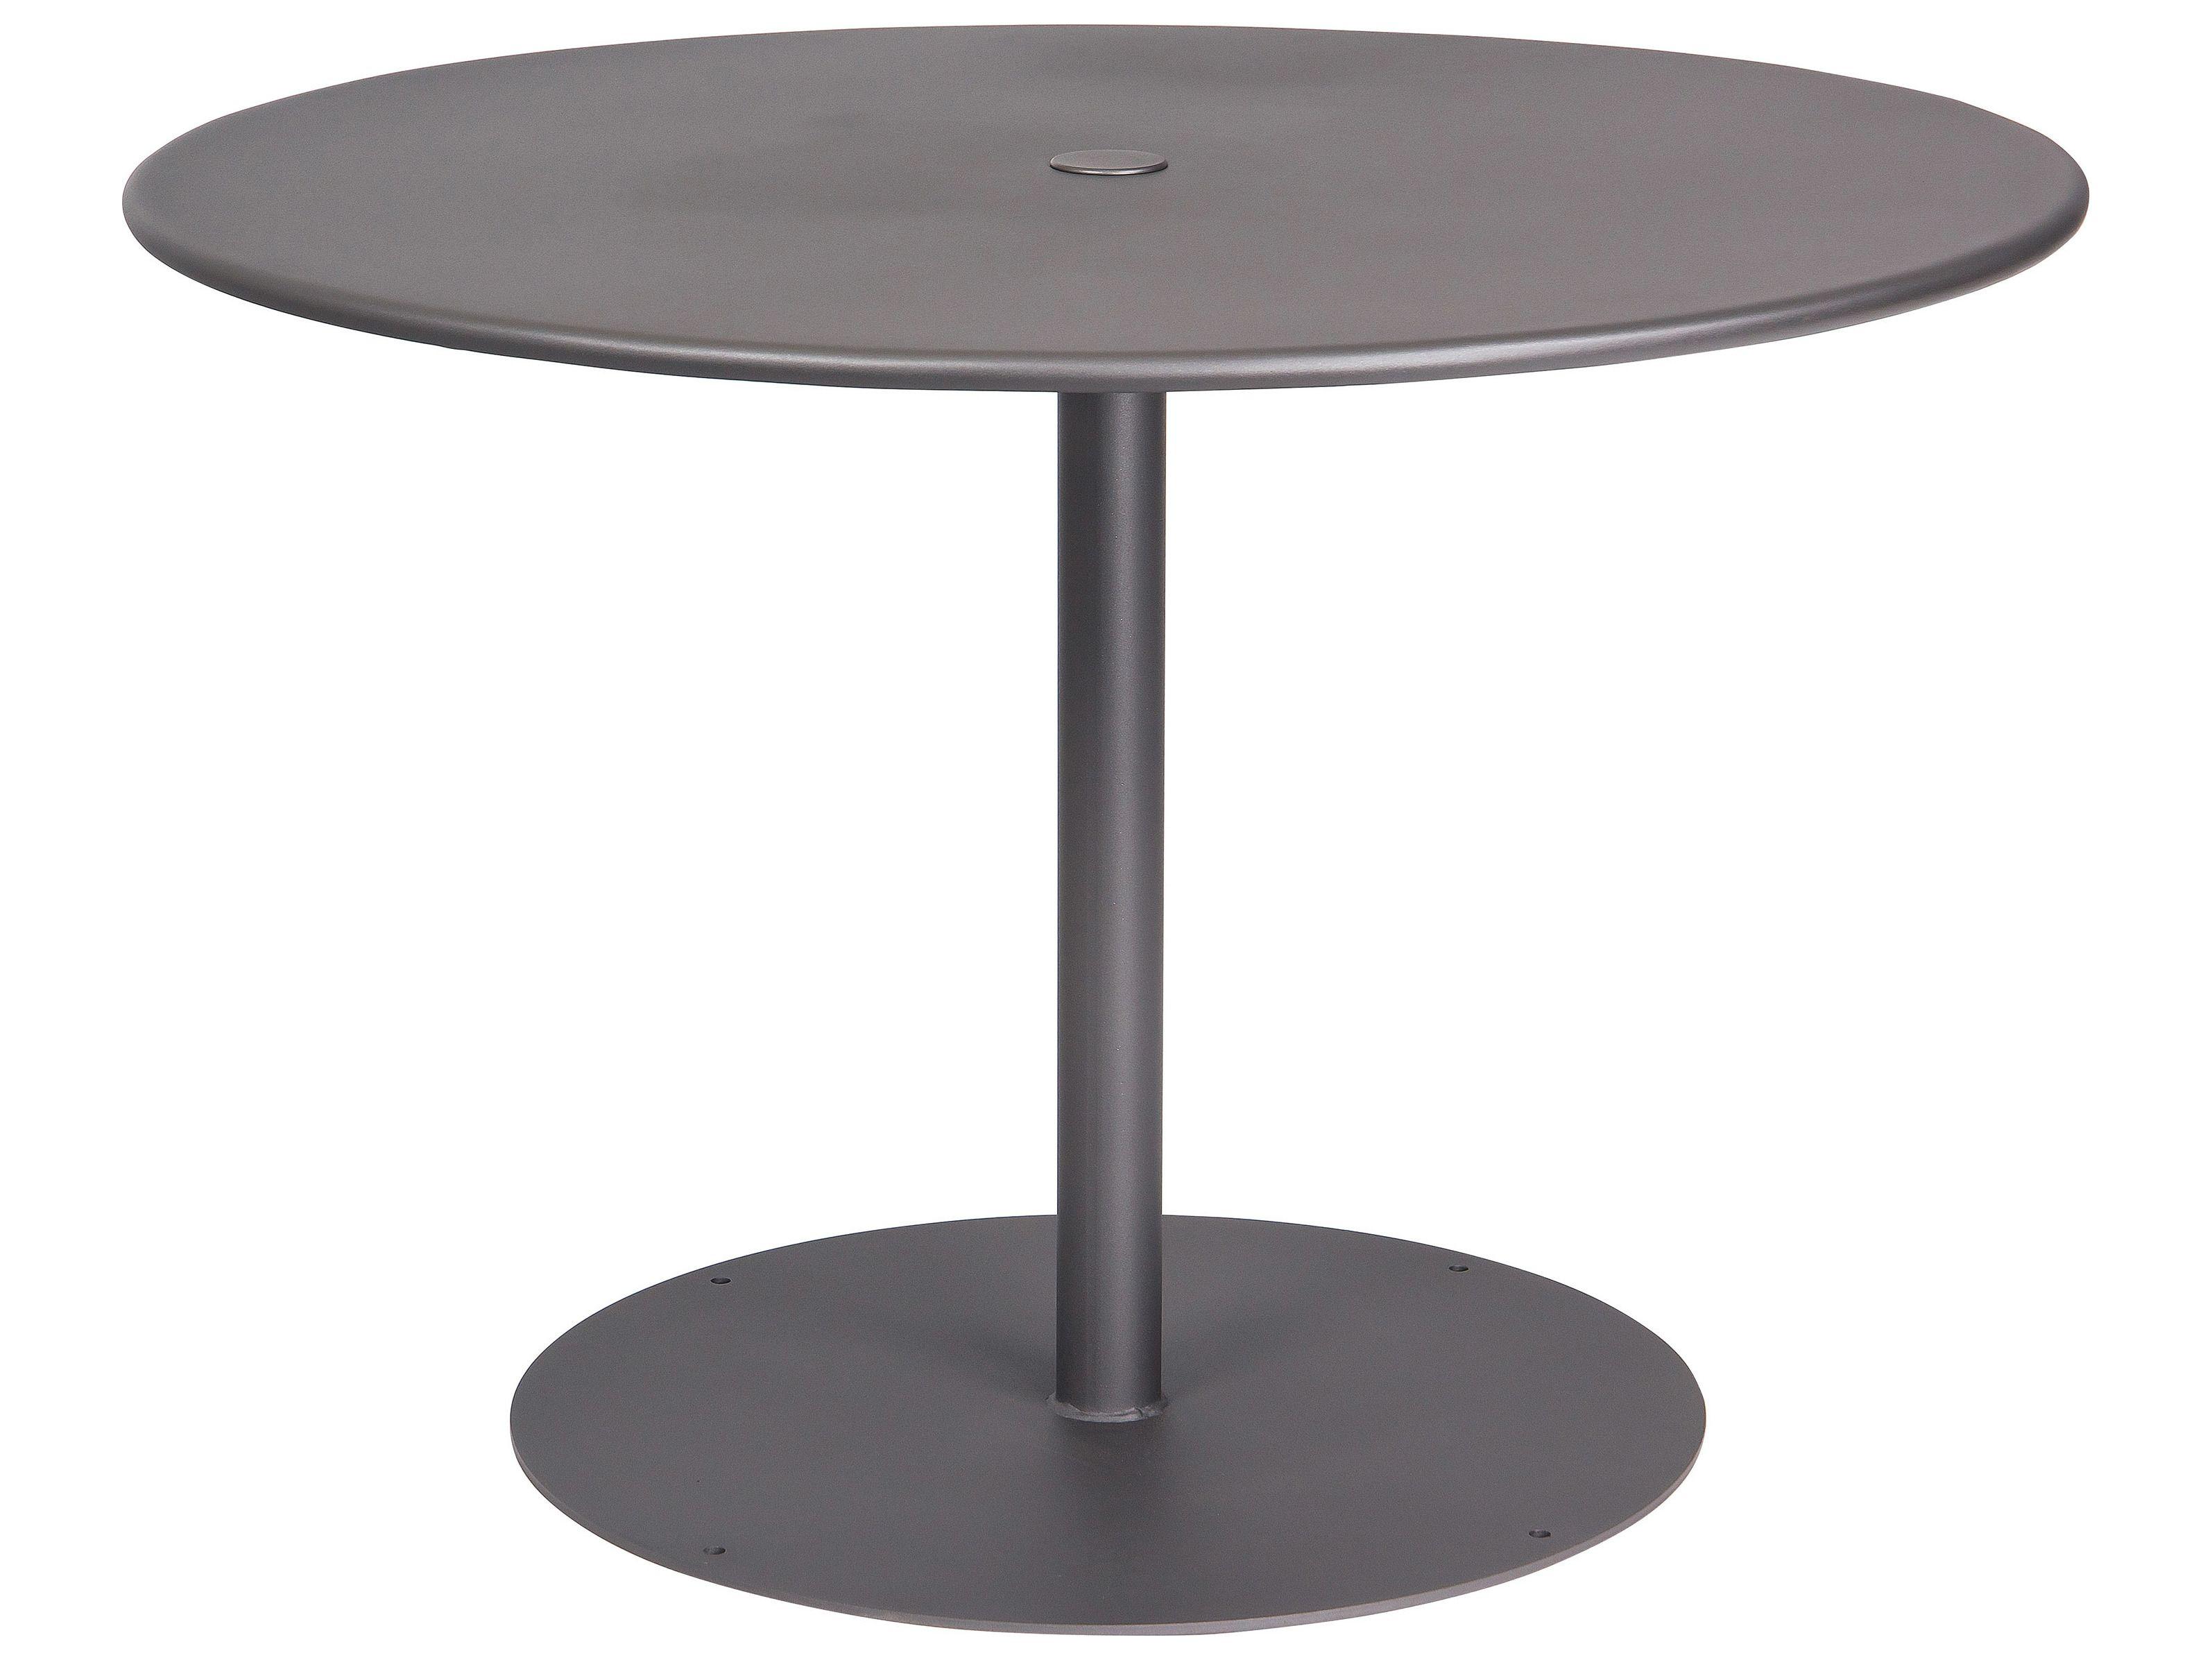 Woodard Wrought Iron Ada 42 Wide Round Dining Table With Umbrella Hole Round Dining Table Wrought Iron Table Wrought Iron [ jpg ]